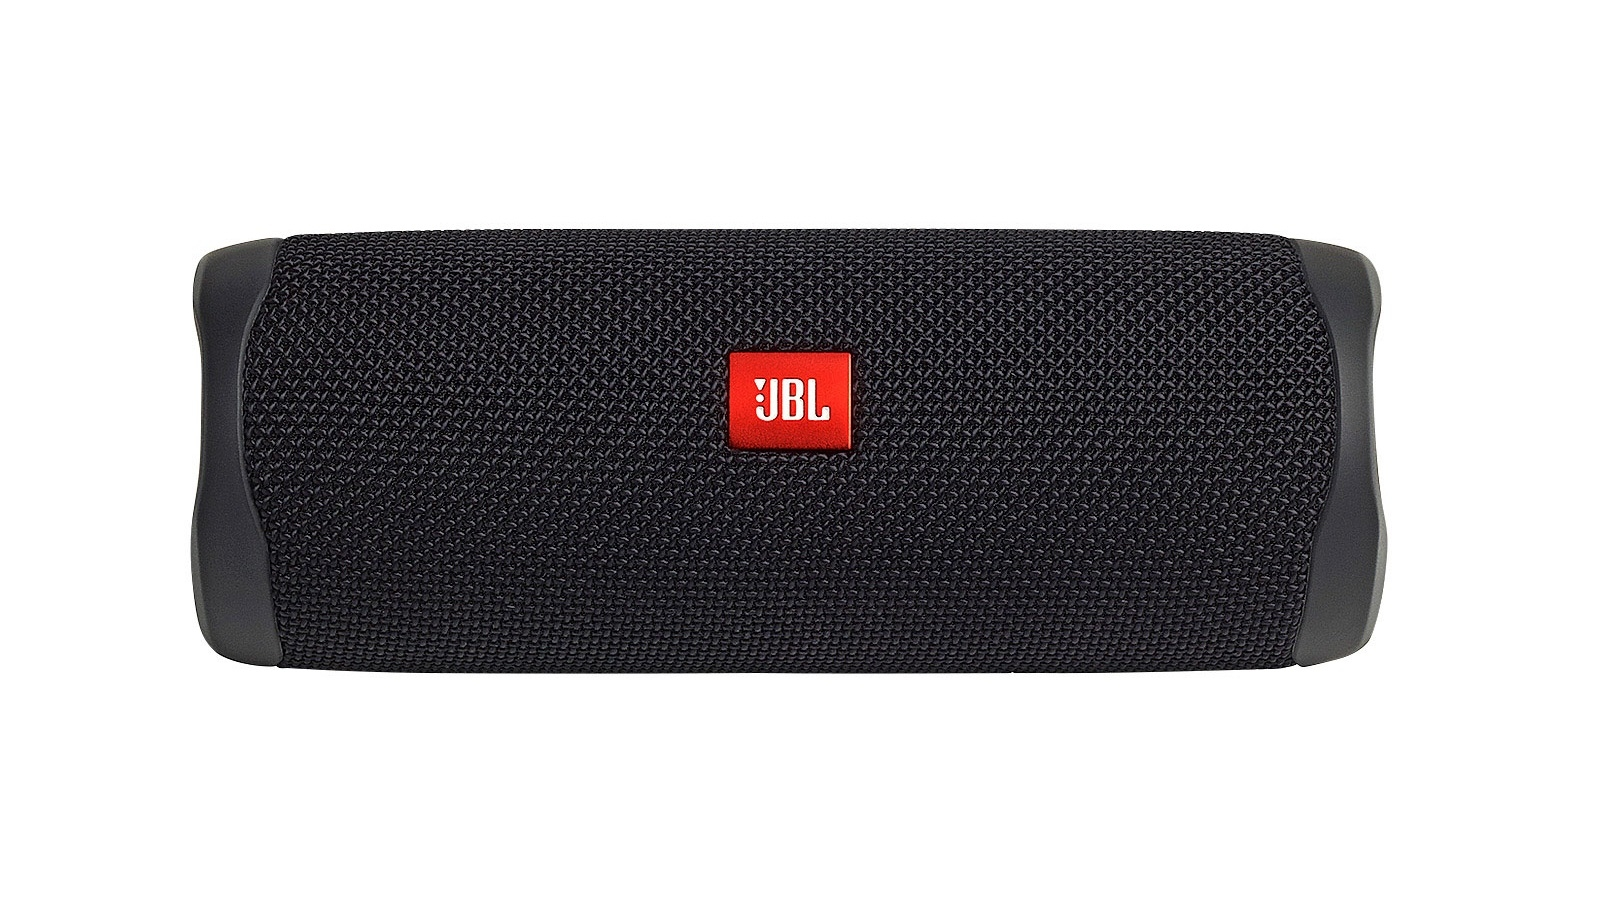 Image of JBL Flip Essential Portable Bluetooth Speaker